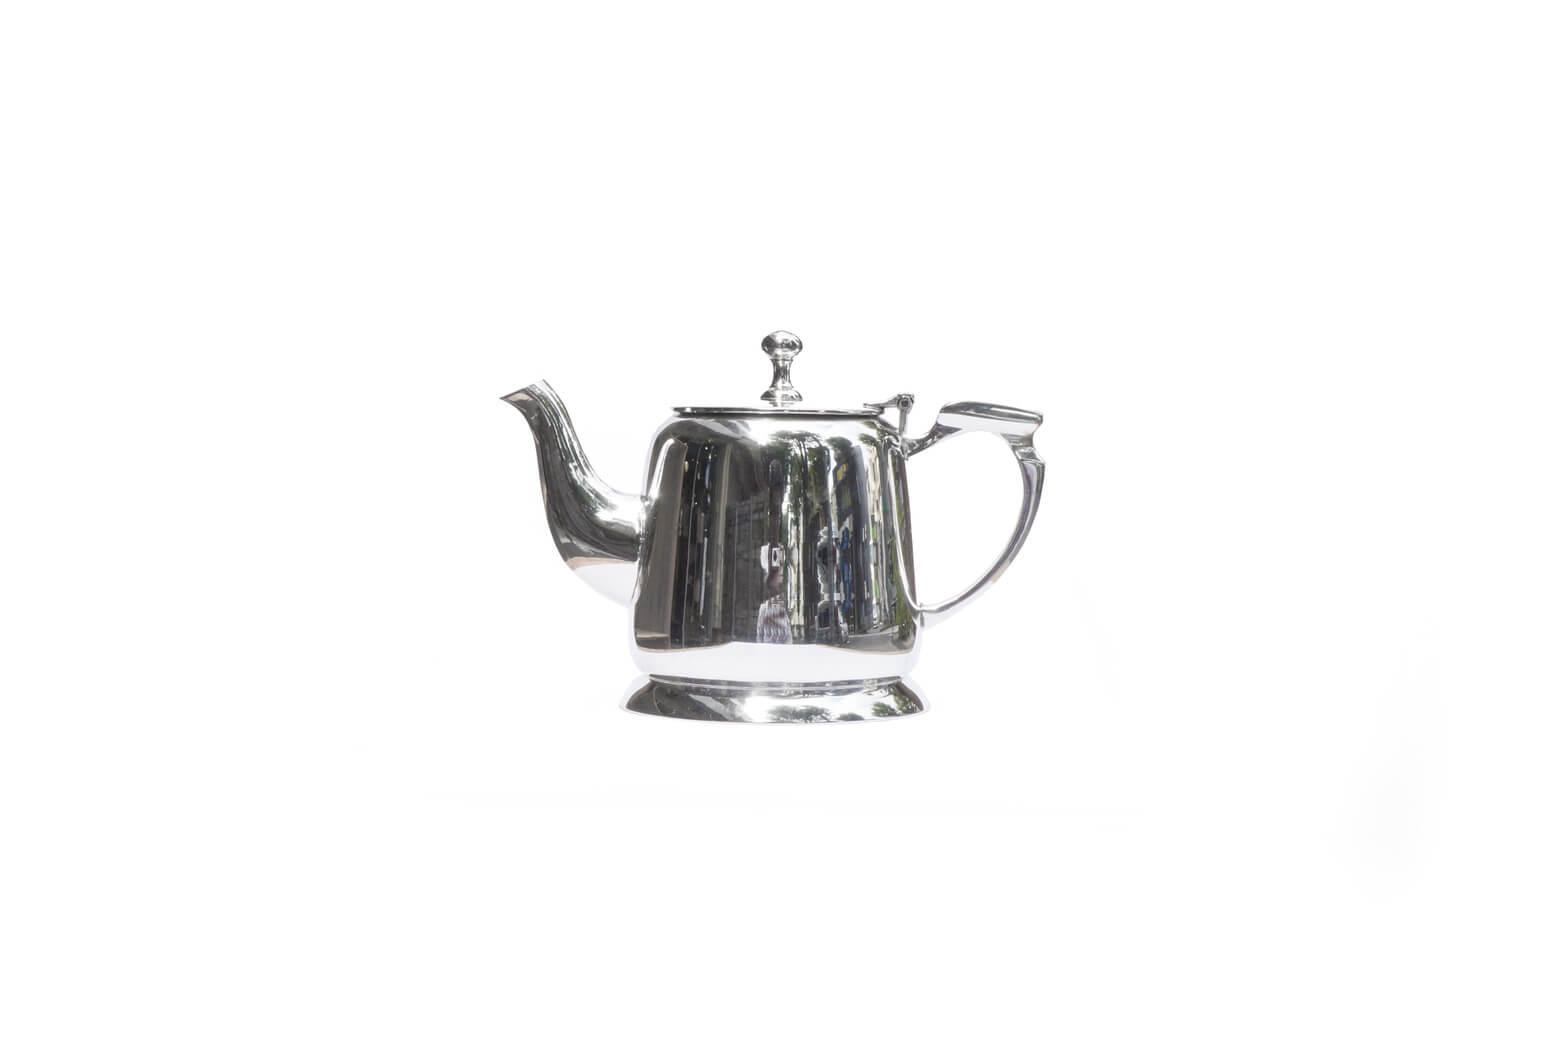 Europe Antique Silver plate Tea pot / アンティーク シルバー プレート ティーポット